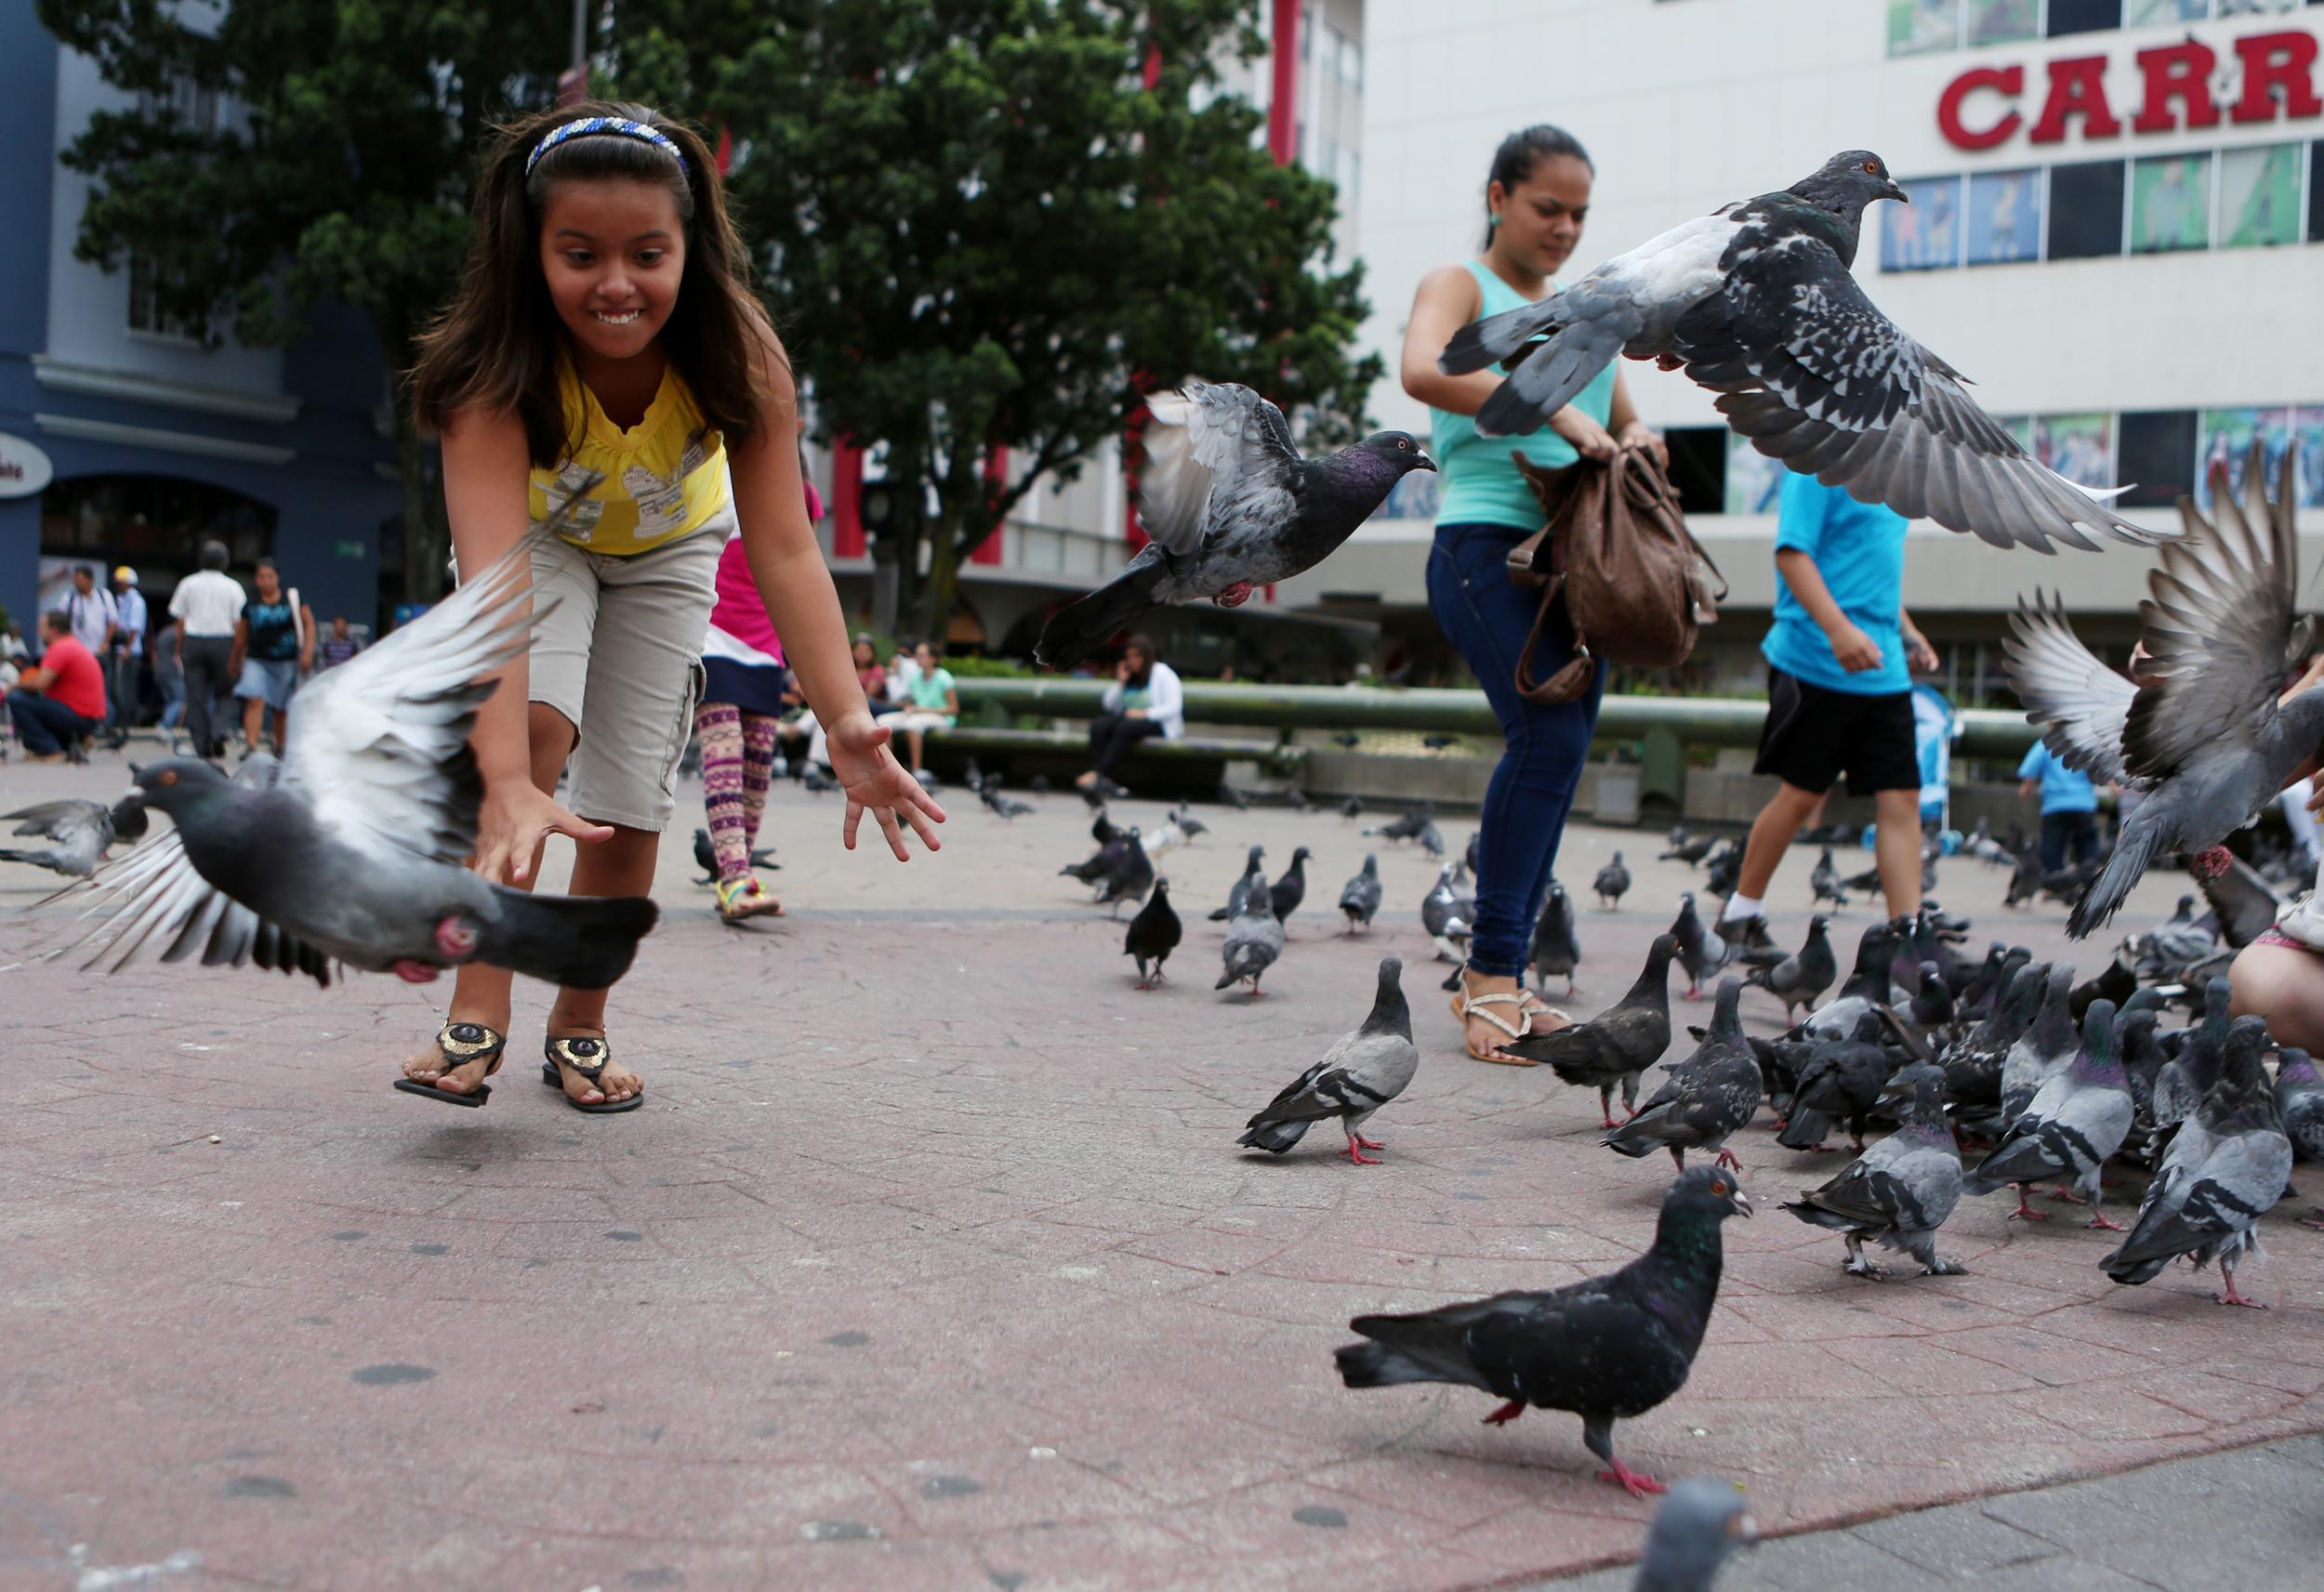 CostaRica_2014_412_bdh.jpg